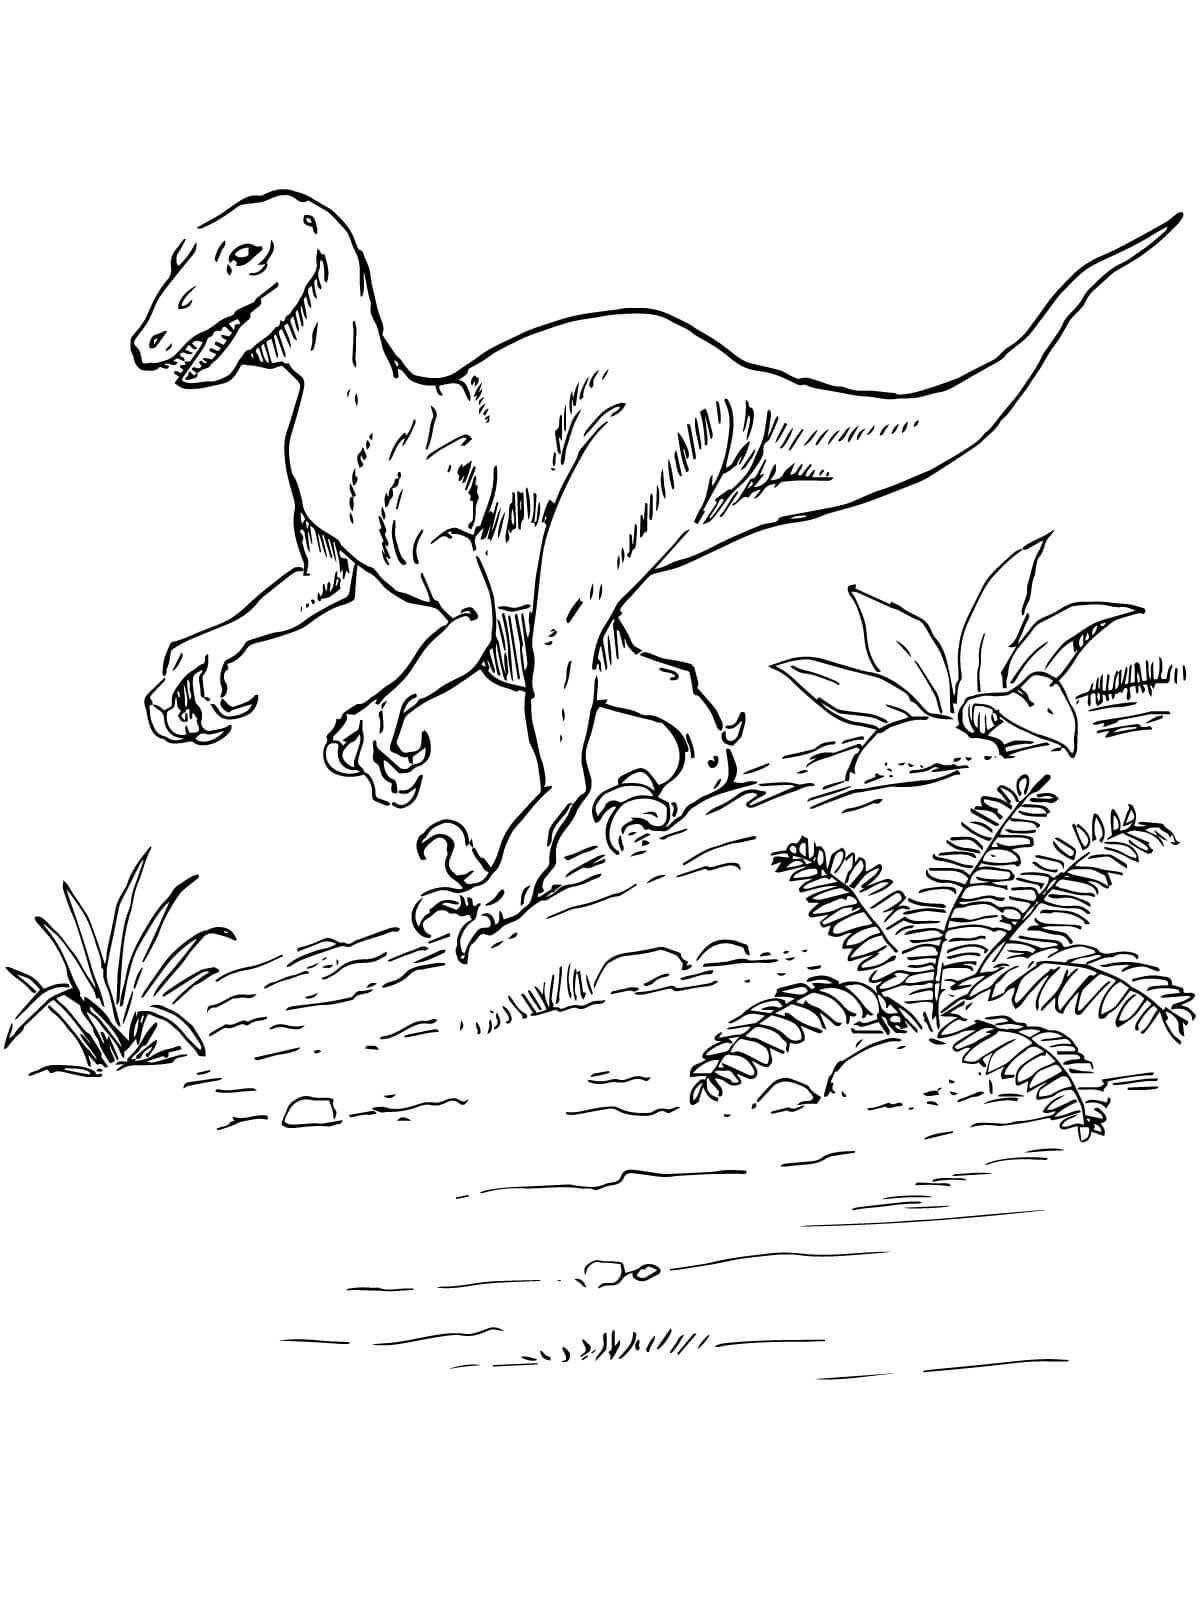 Top 35 Free Printable Unique Dinosaur Coloring Pages